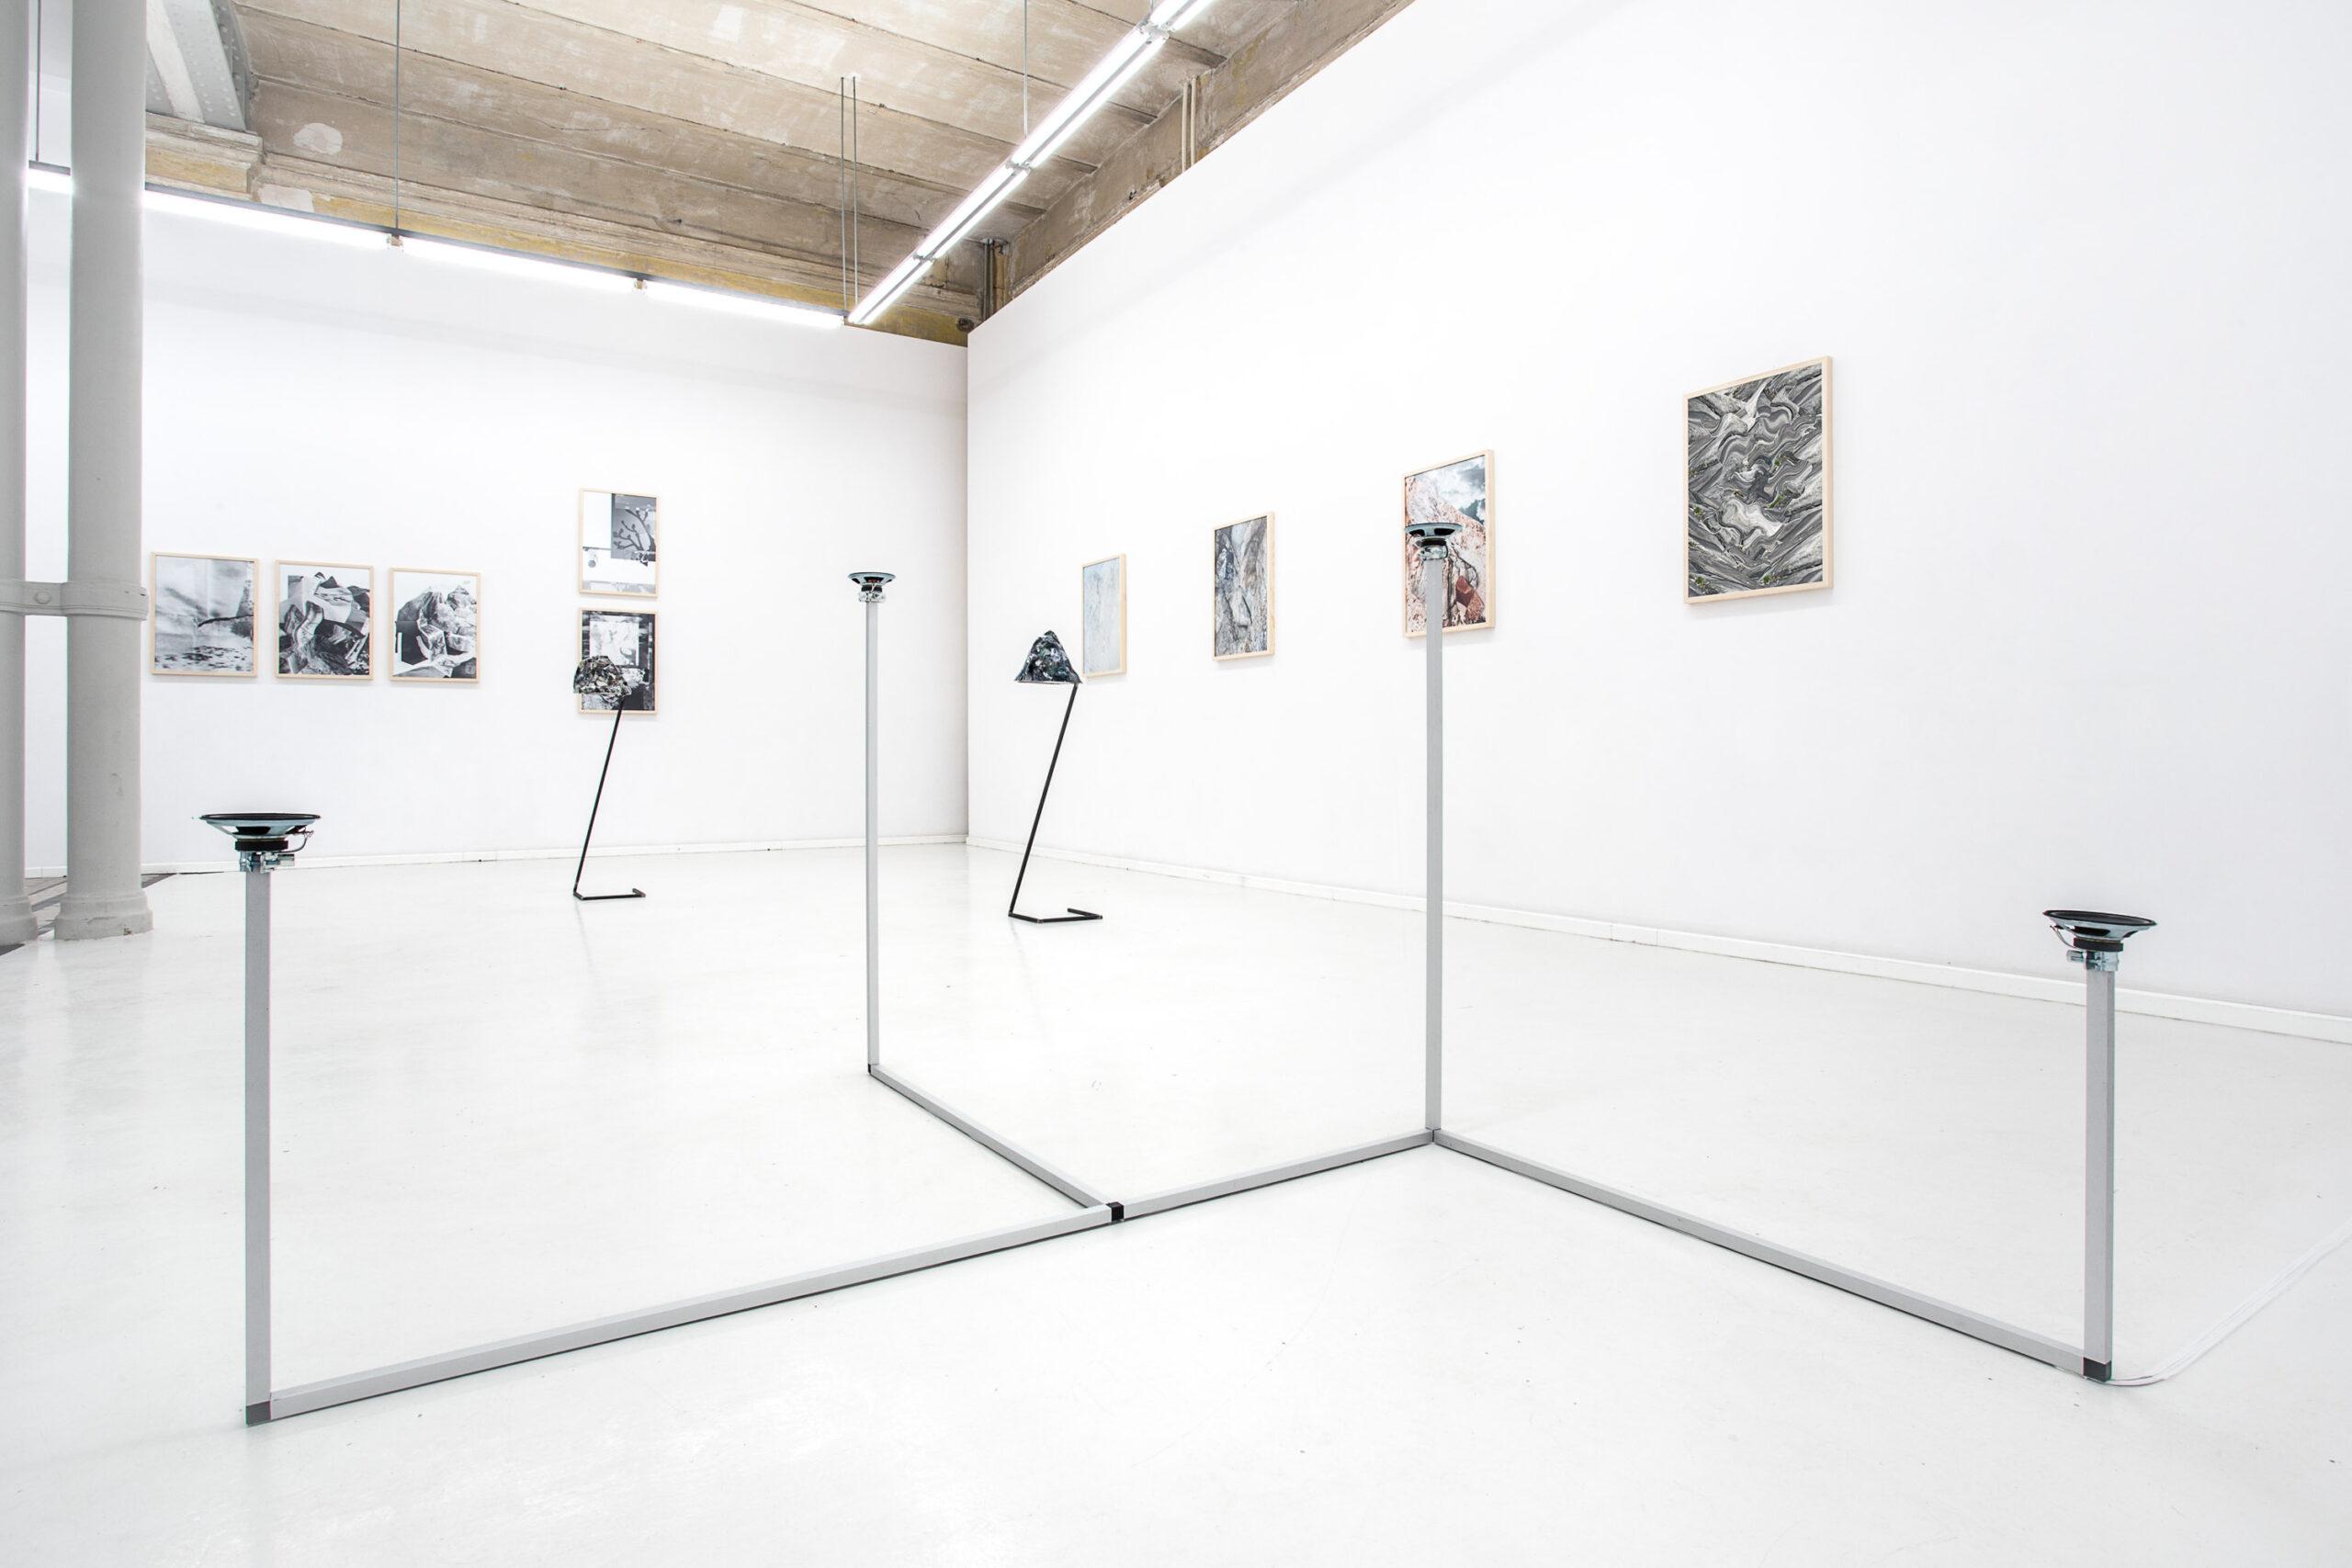 Ewa Doroszenko – Impossible Territory, exhibition view 08